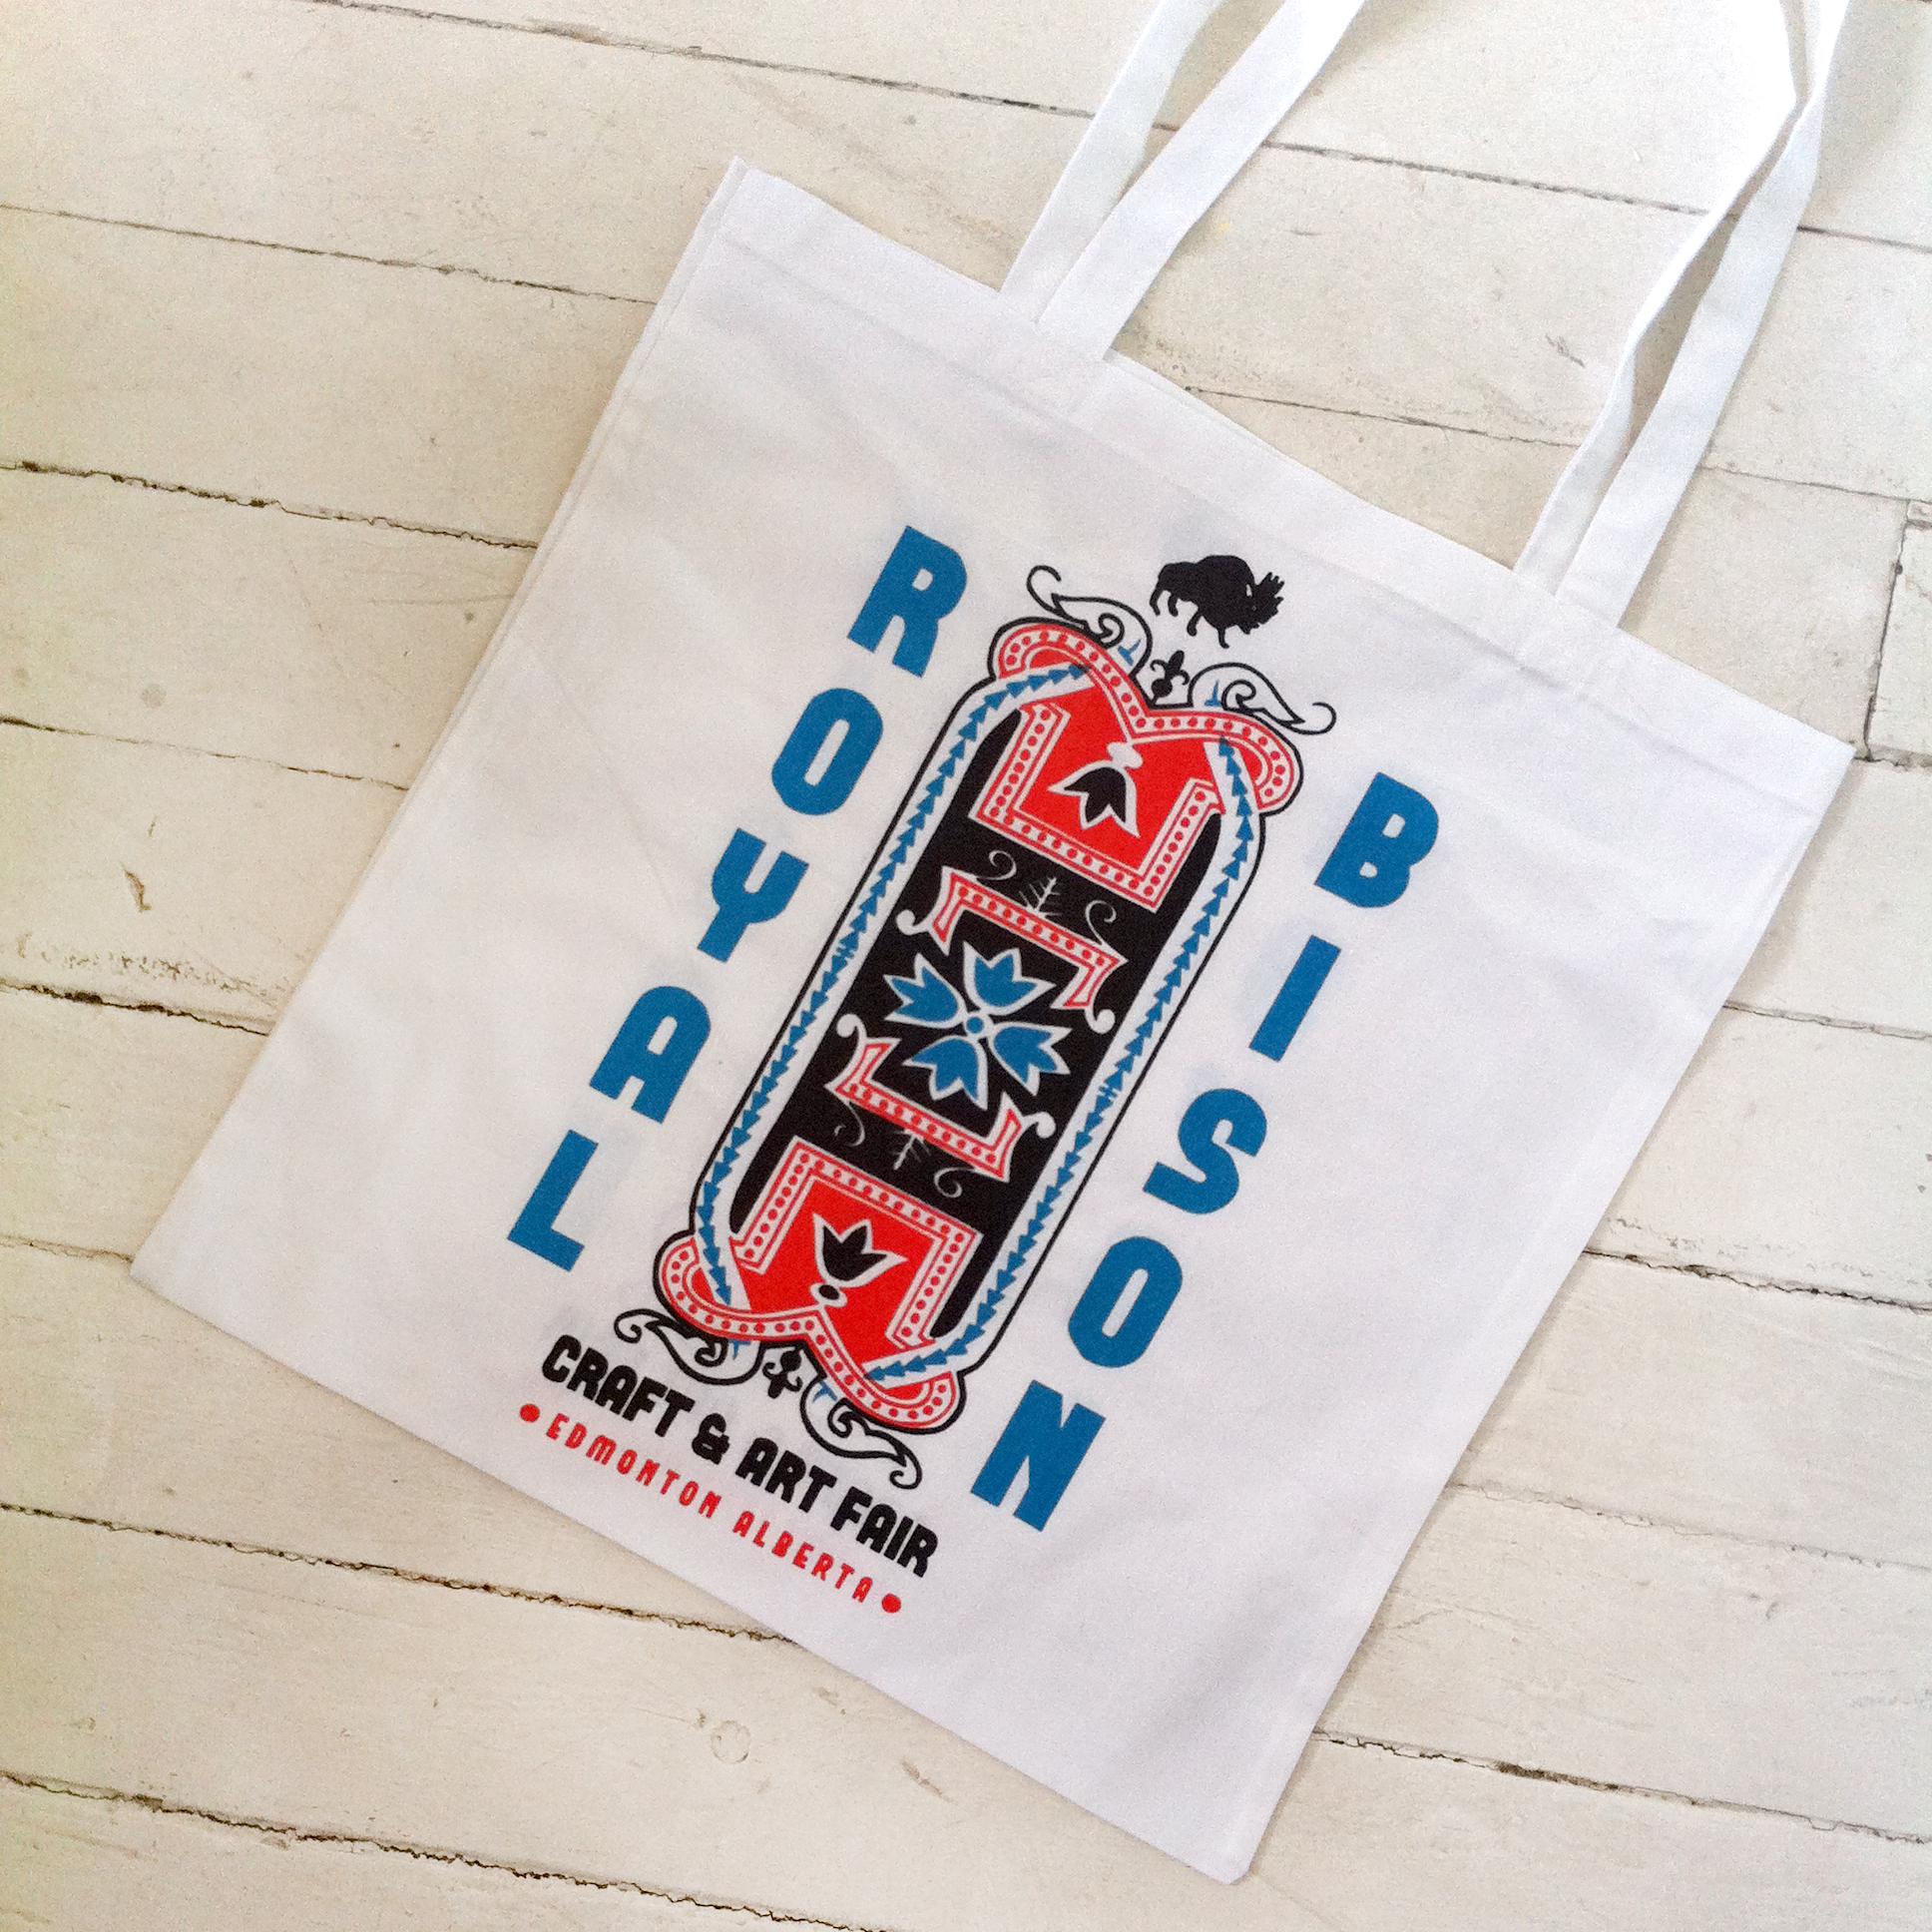 2014 artist designed tote bag by Laurel Westlund.